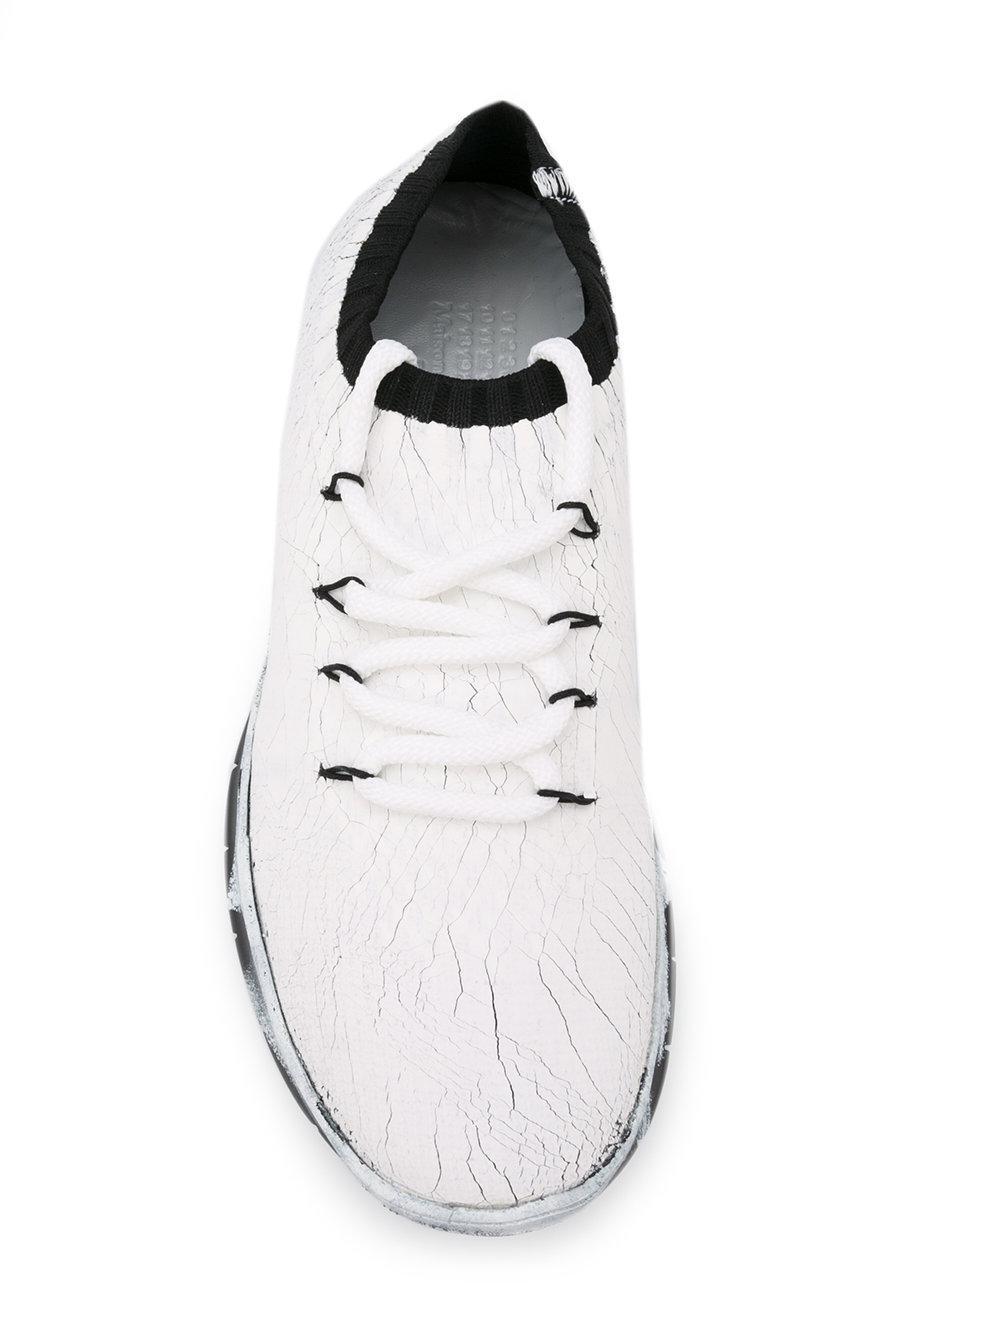 Maison MargielaCracked sponge painted sneakers wz7k6ll